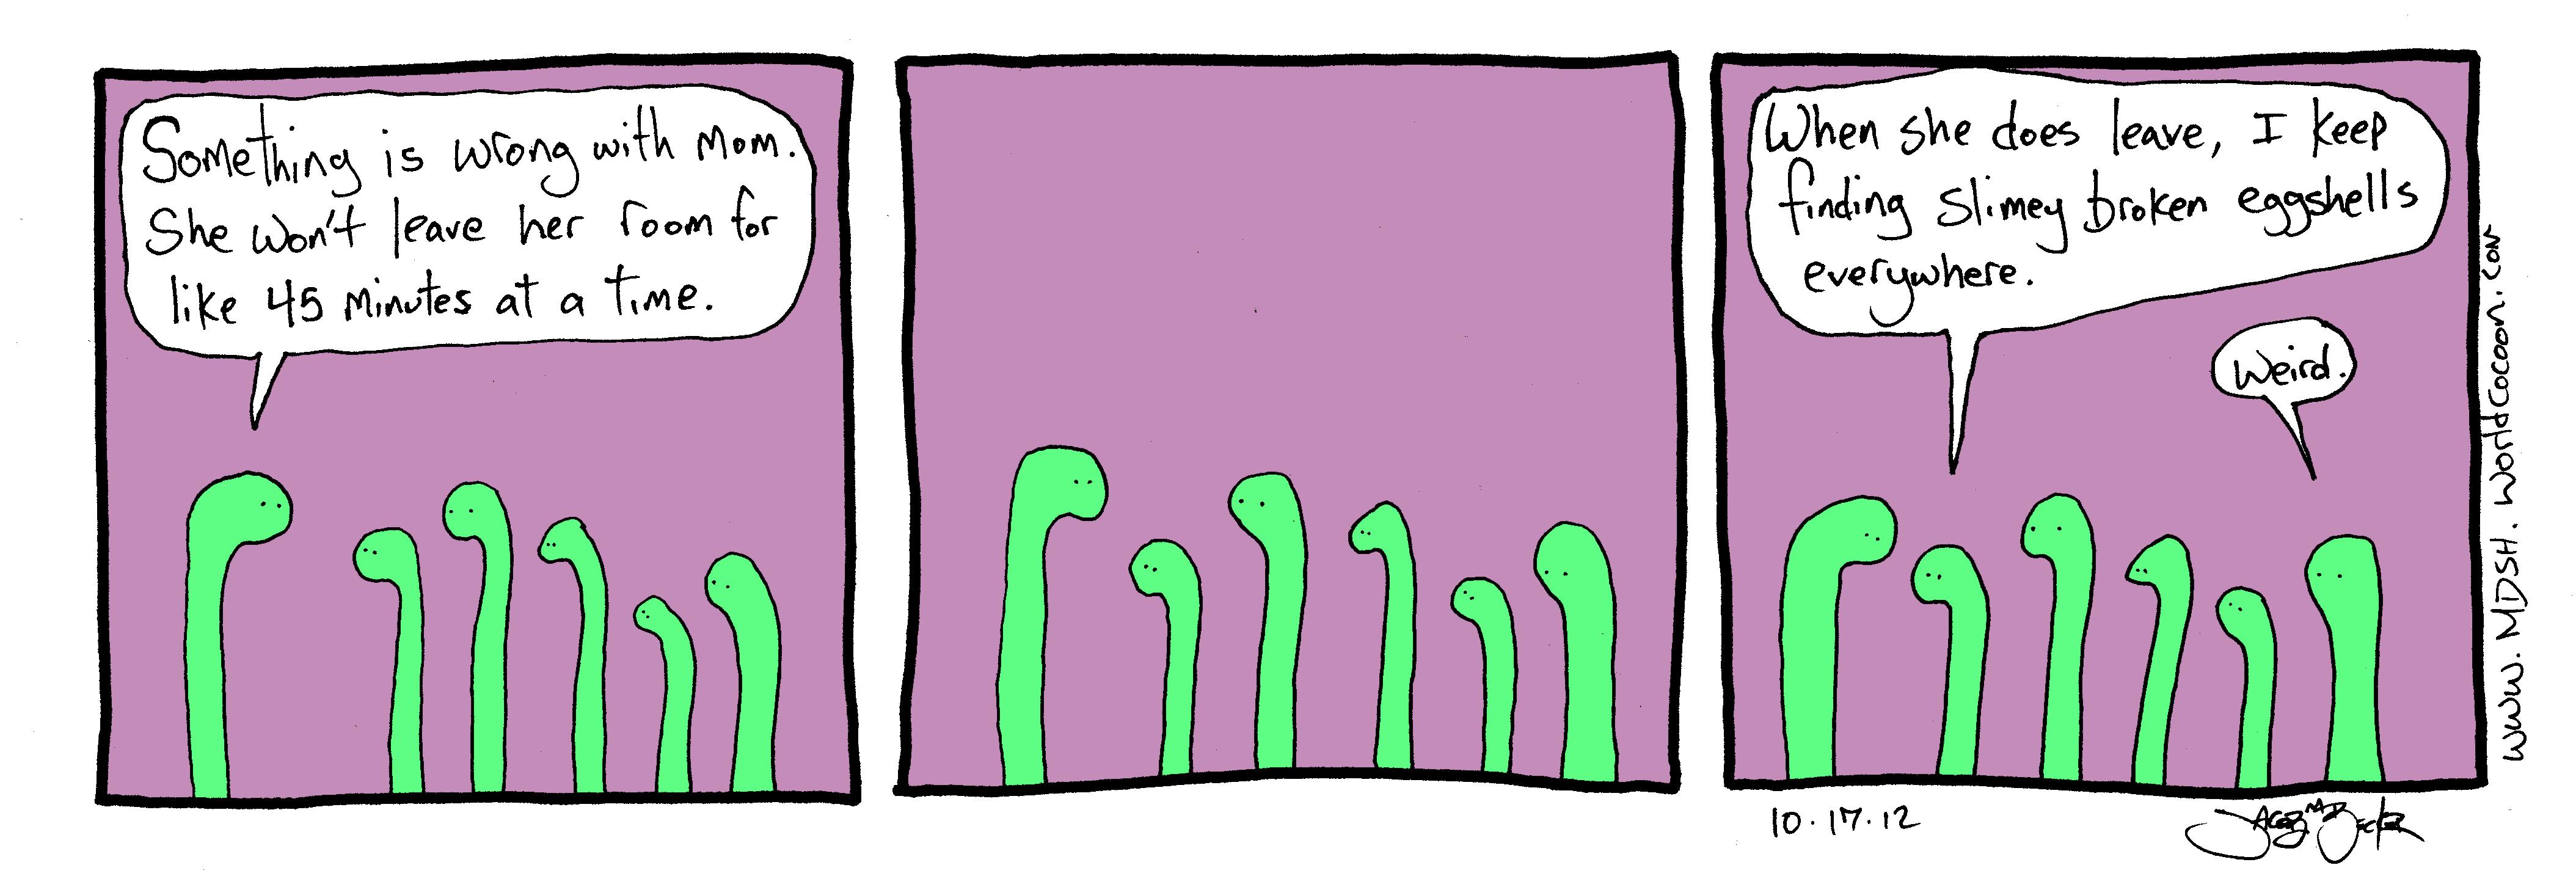 10/17/2012